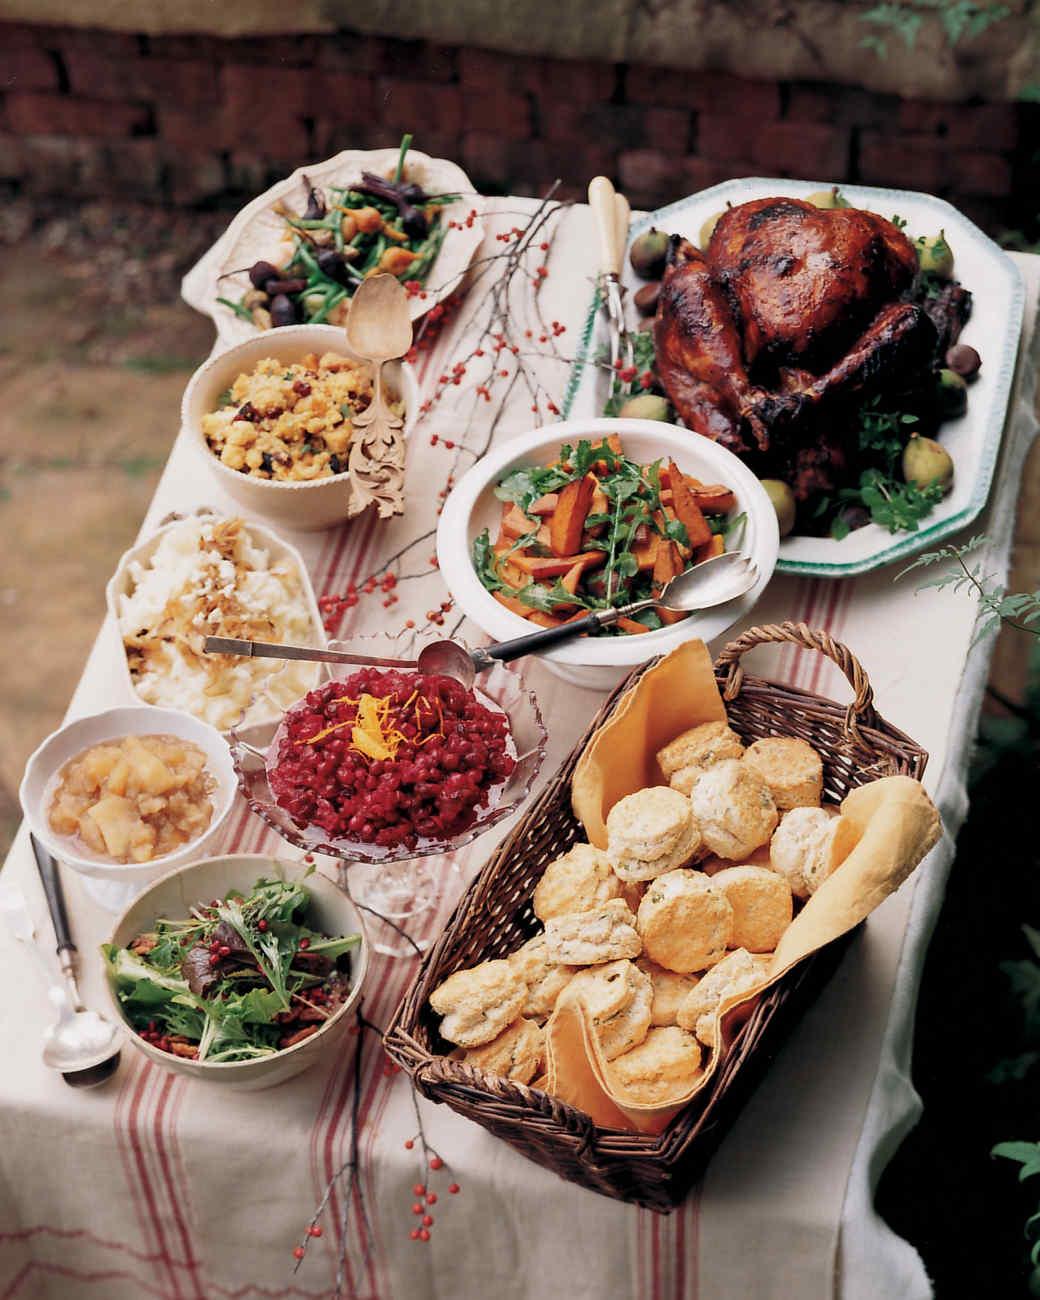 North Carolina Barbecue Turkey